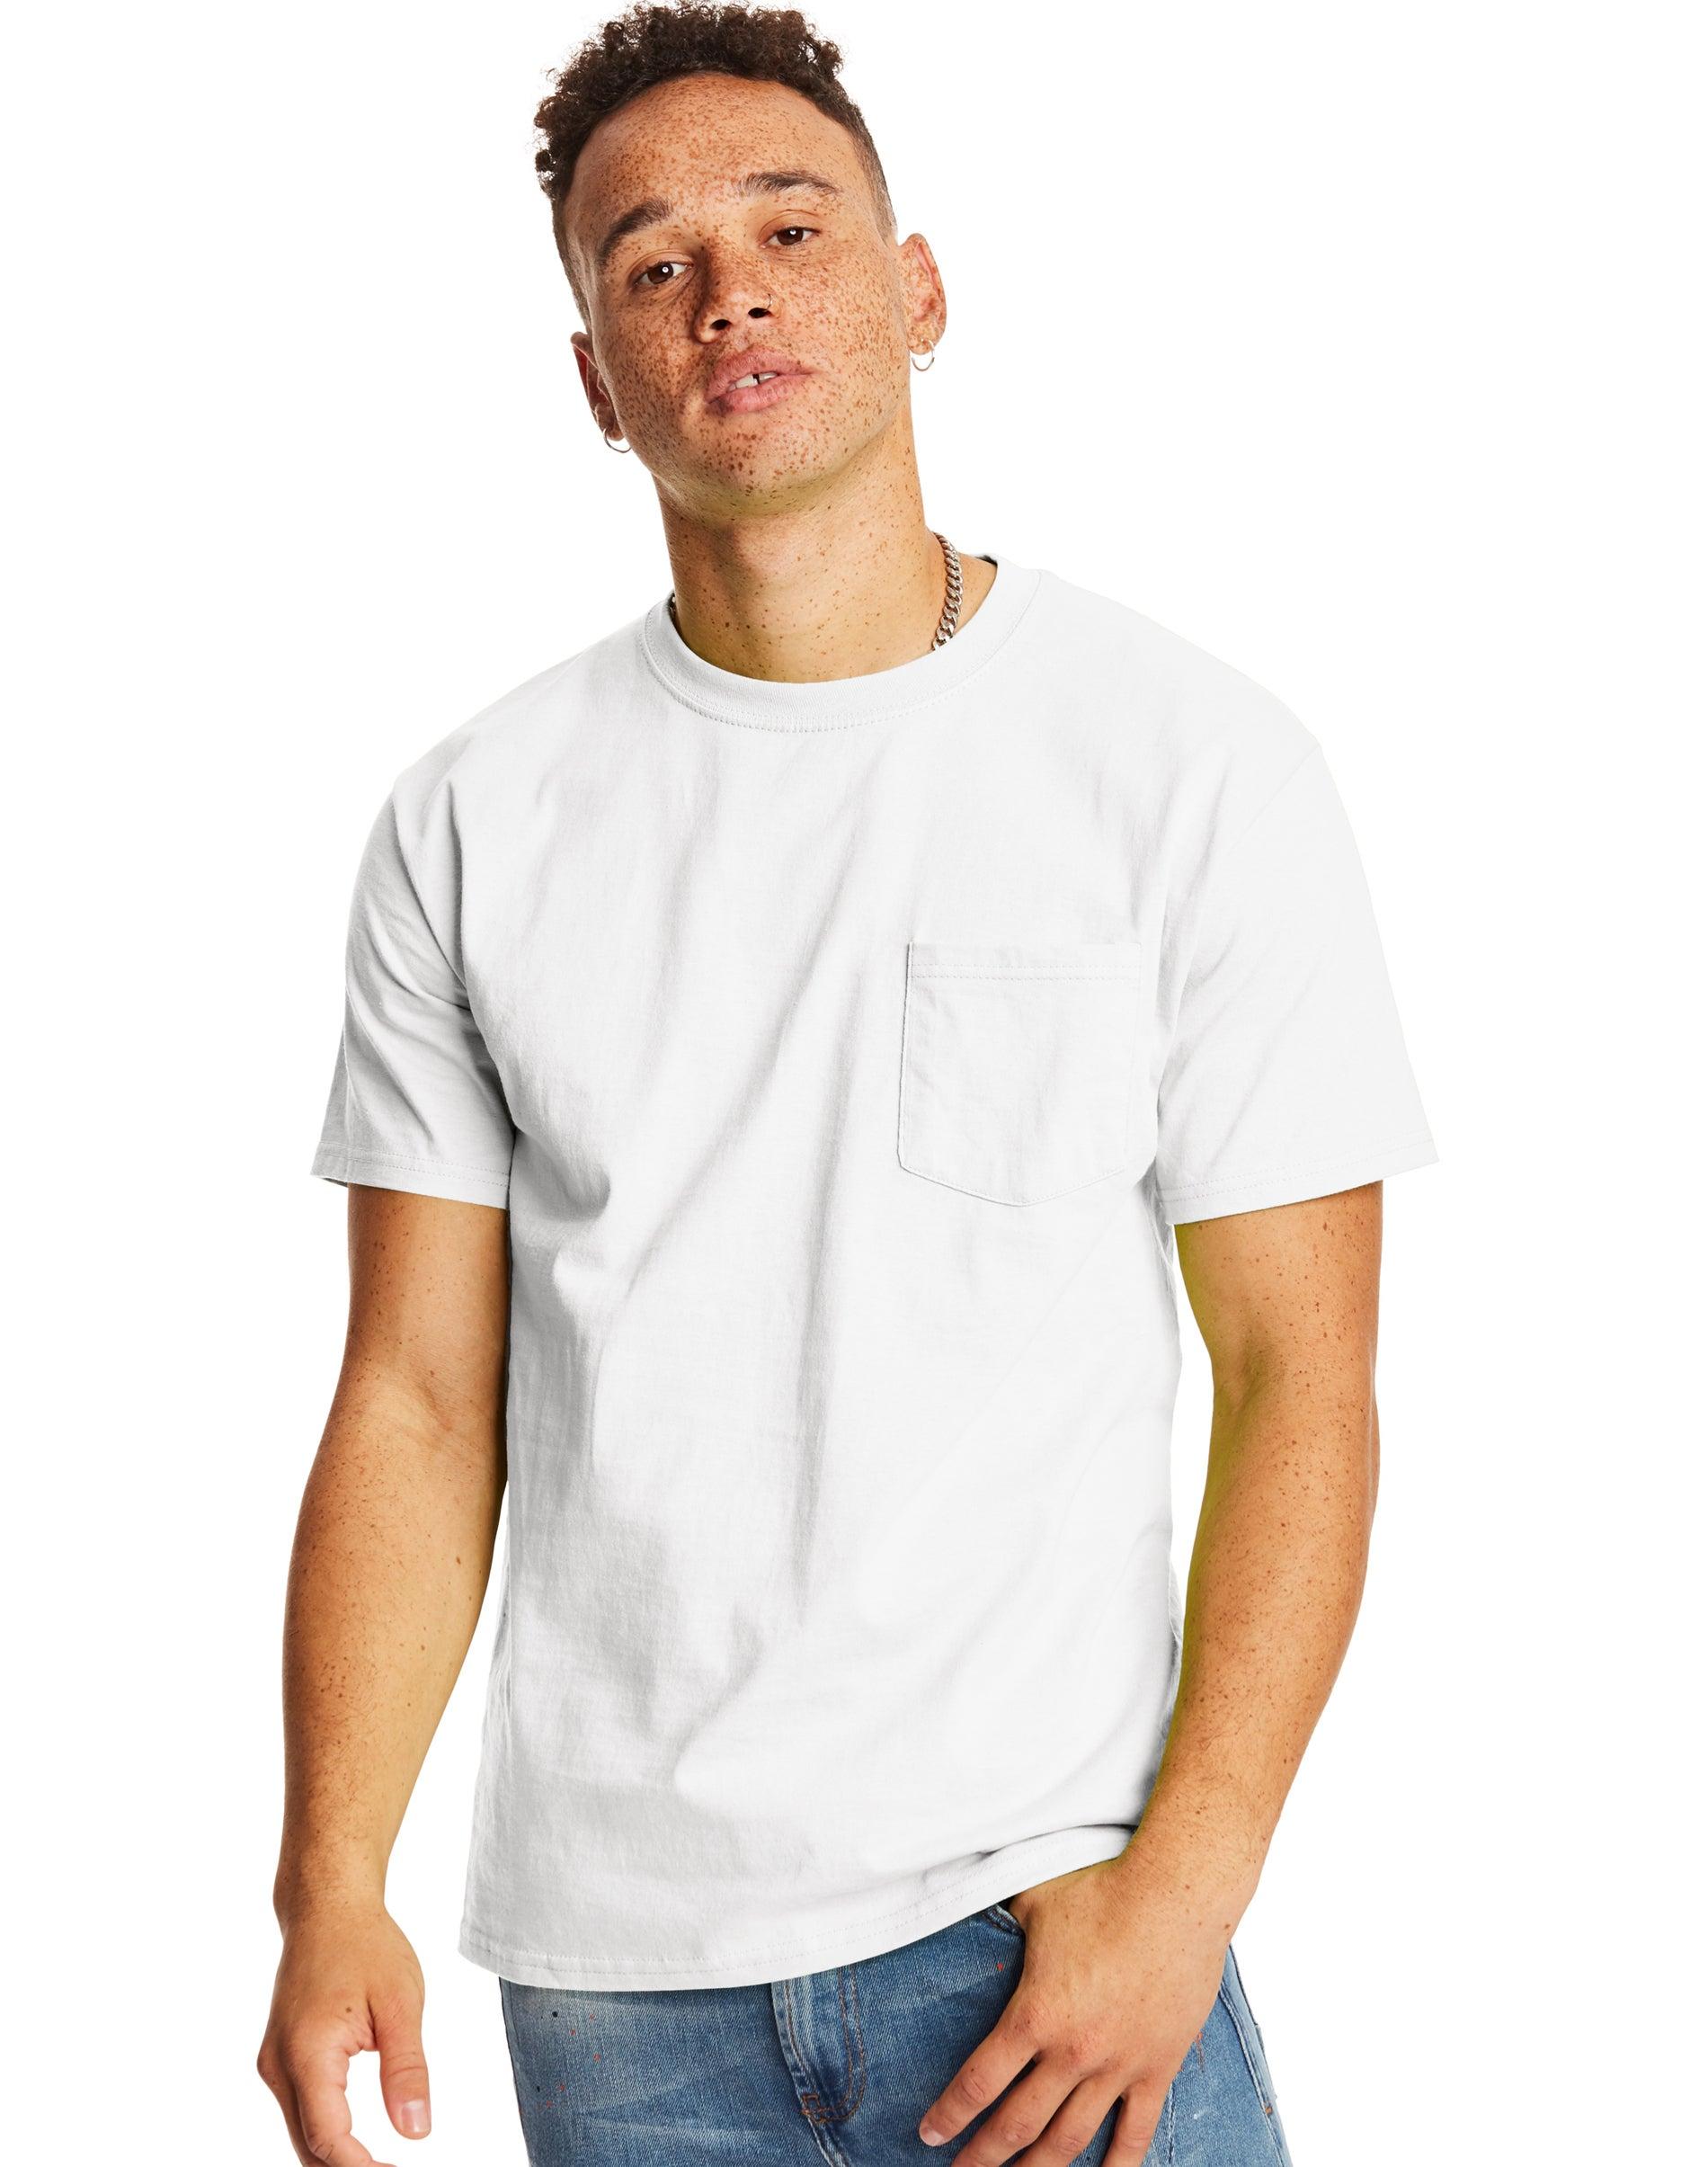 Hanes Mens Big Crew T-Shirt-Sizes Denim Blue Pack of 5